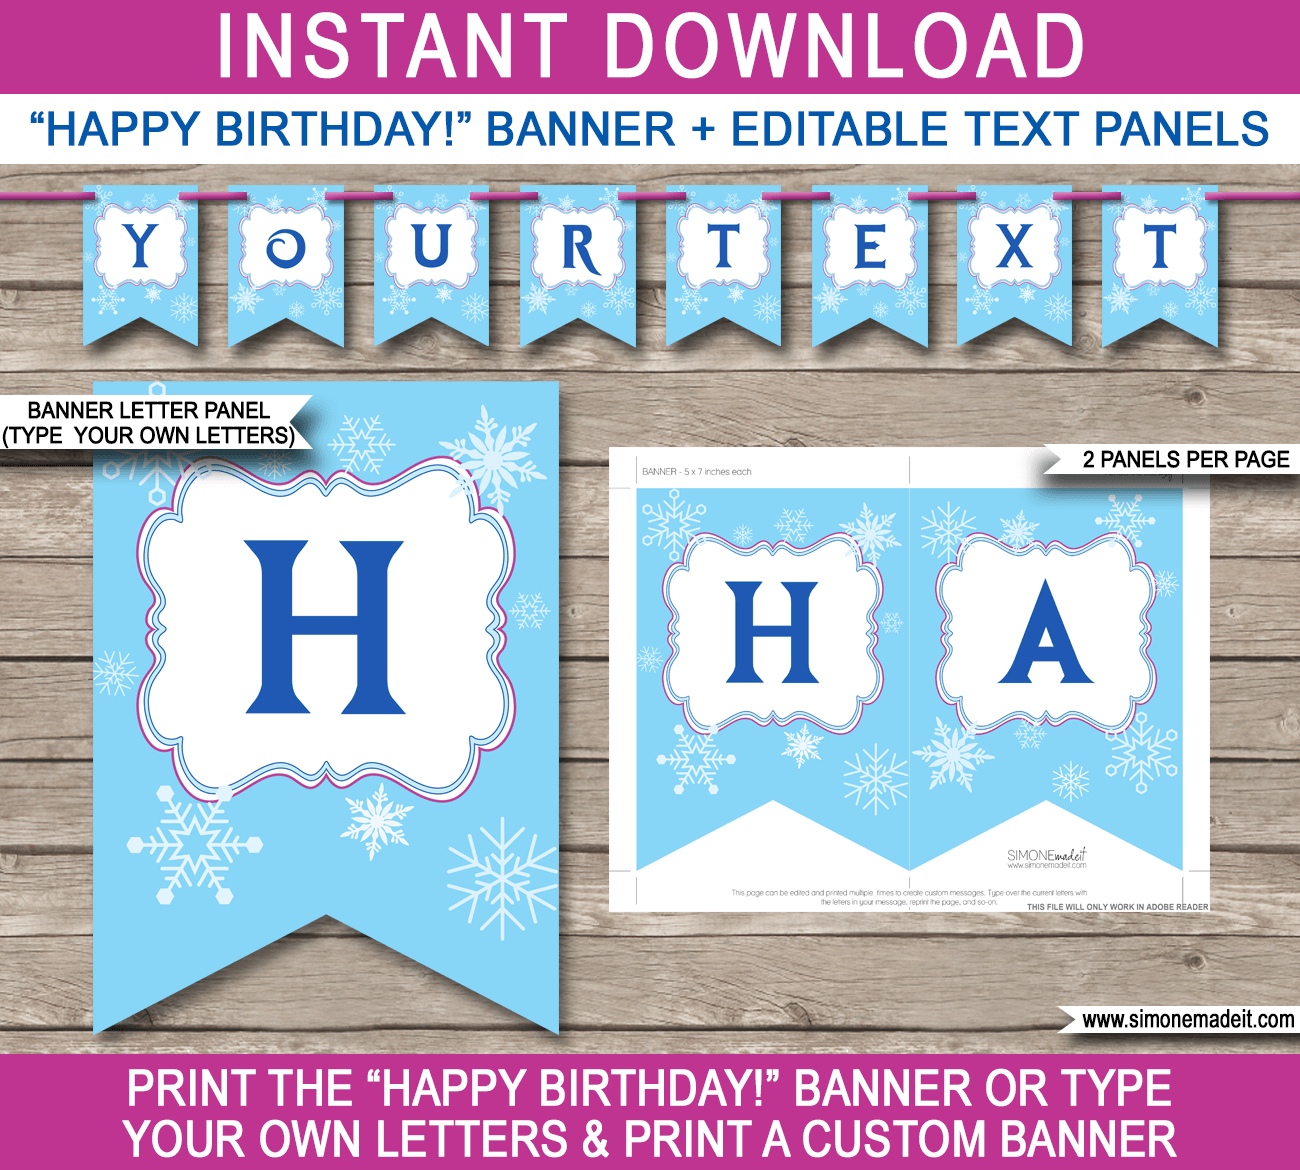 Birthday Banner Template Word  Sansurabionetassociats Intended For Free Happy Birthday Banner Templates Download